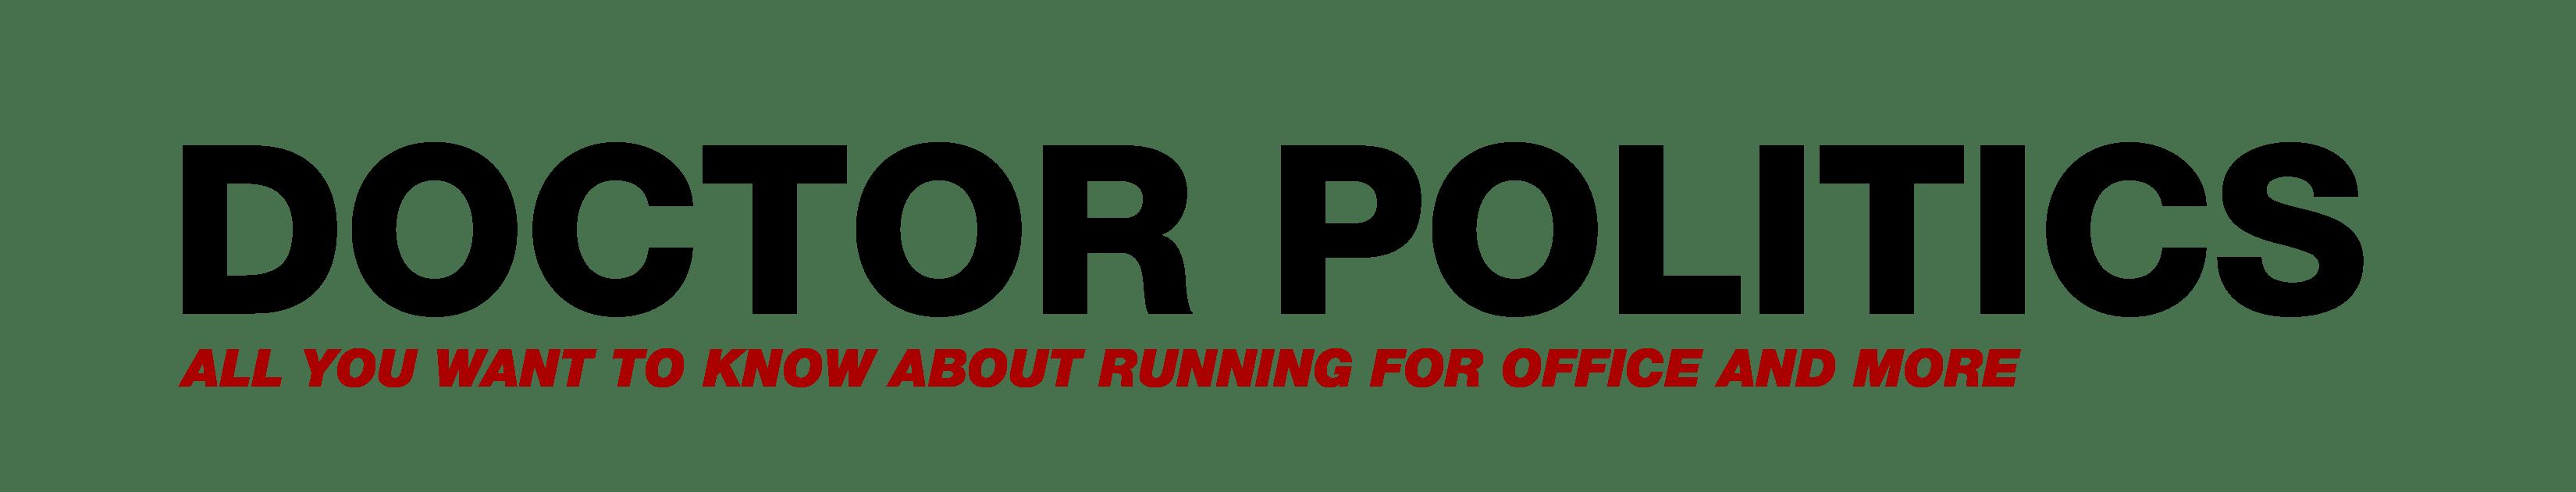 Dr. Politics logo